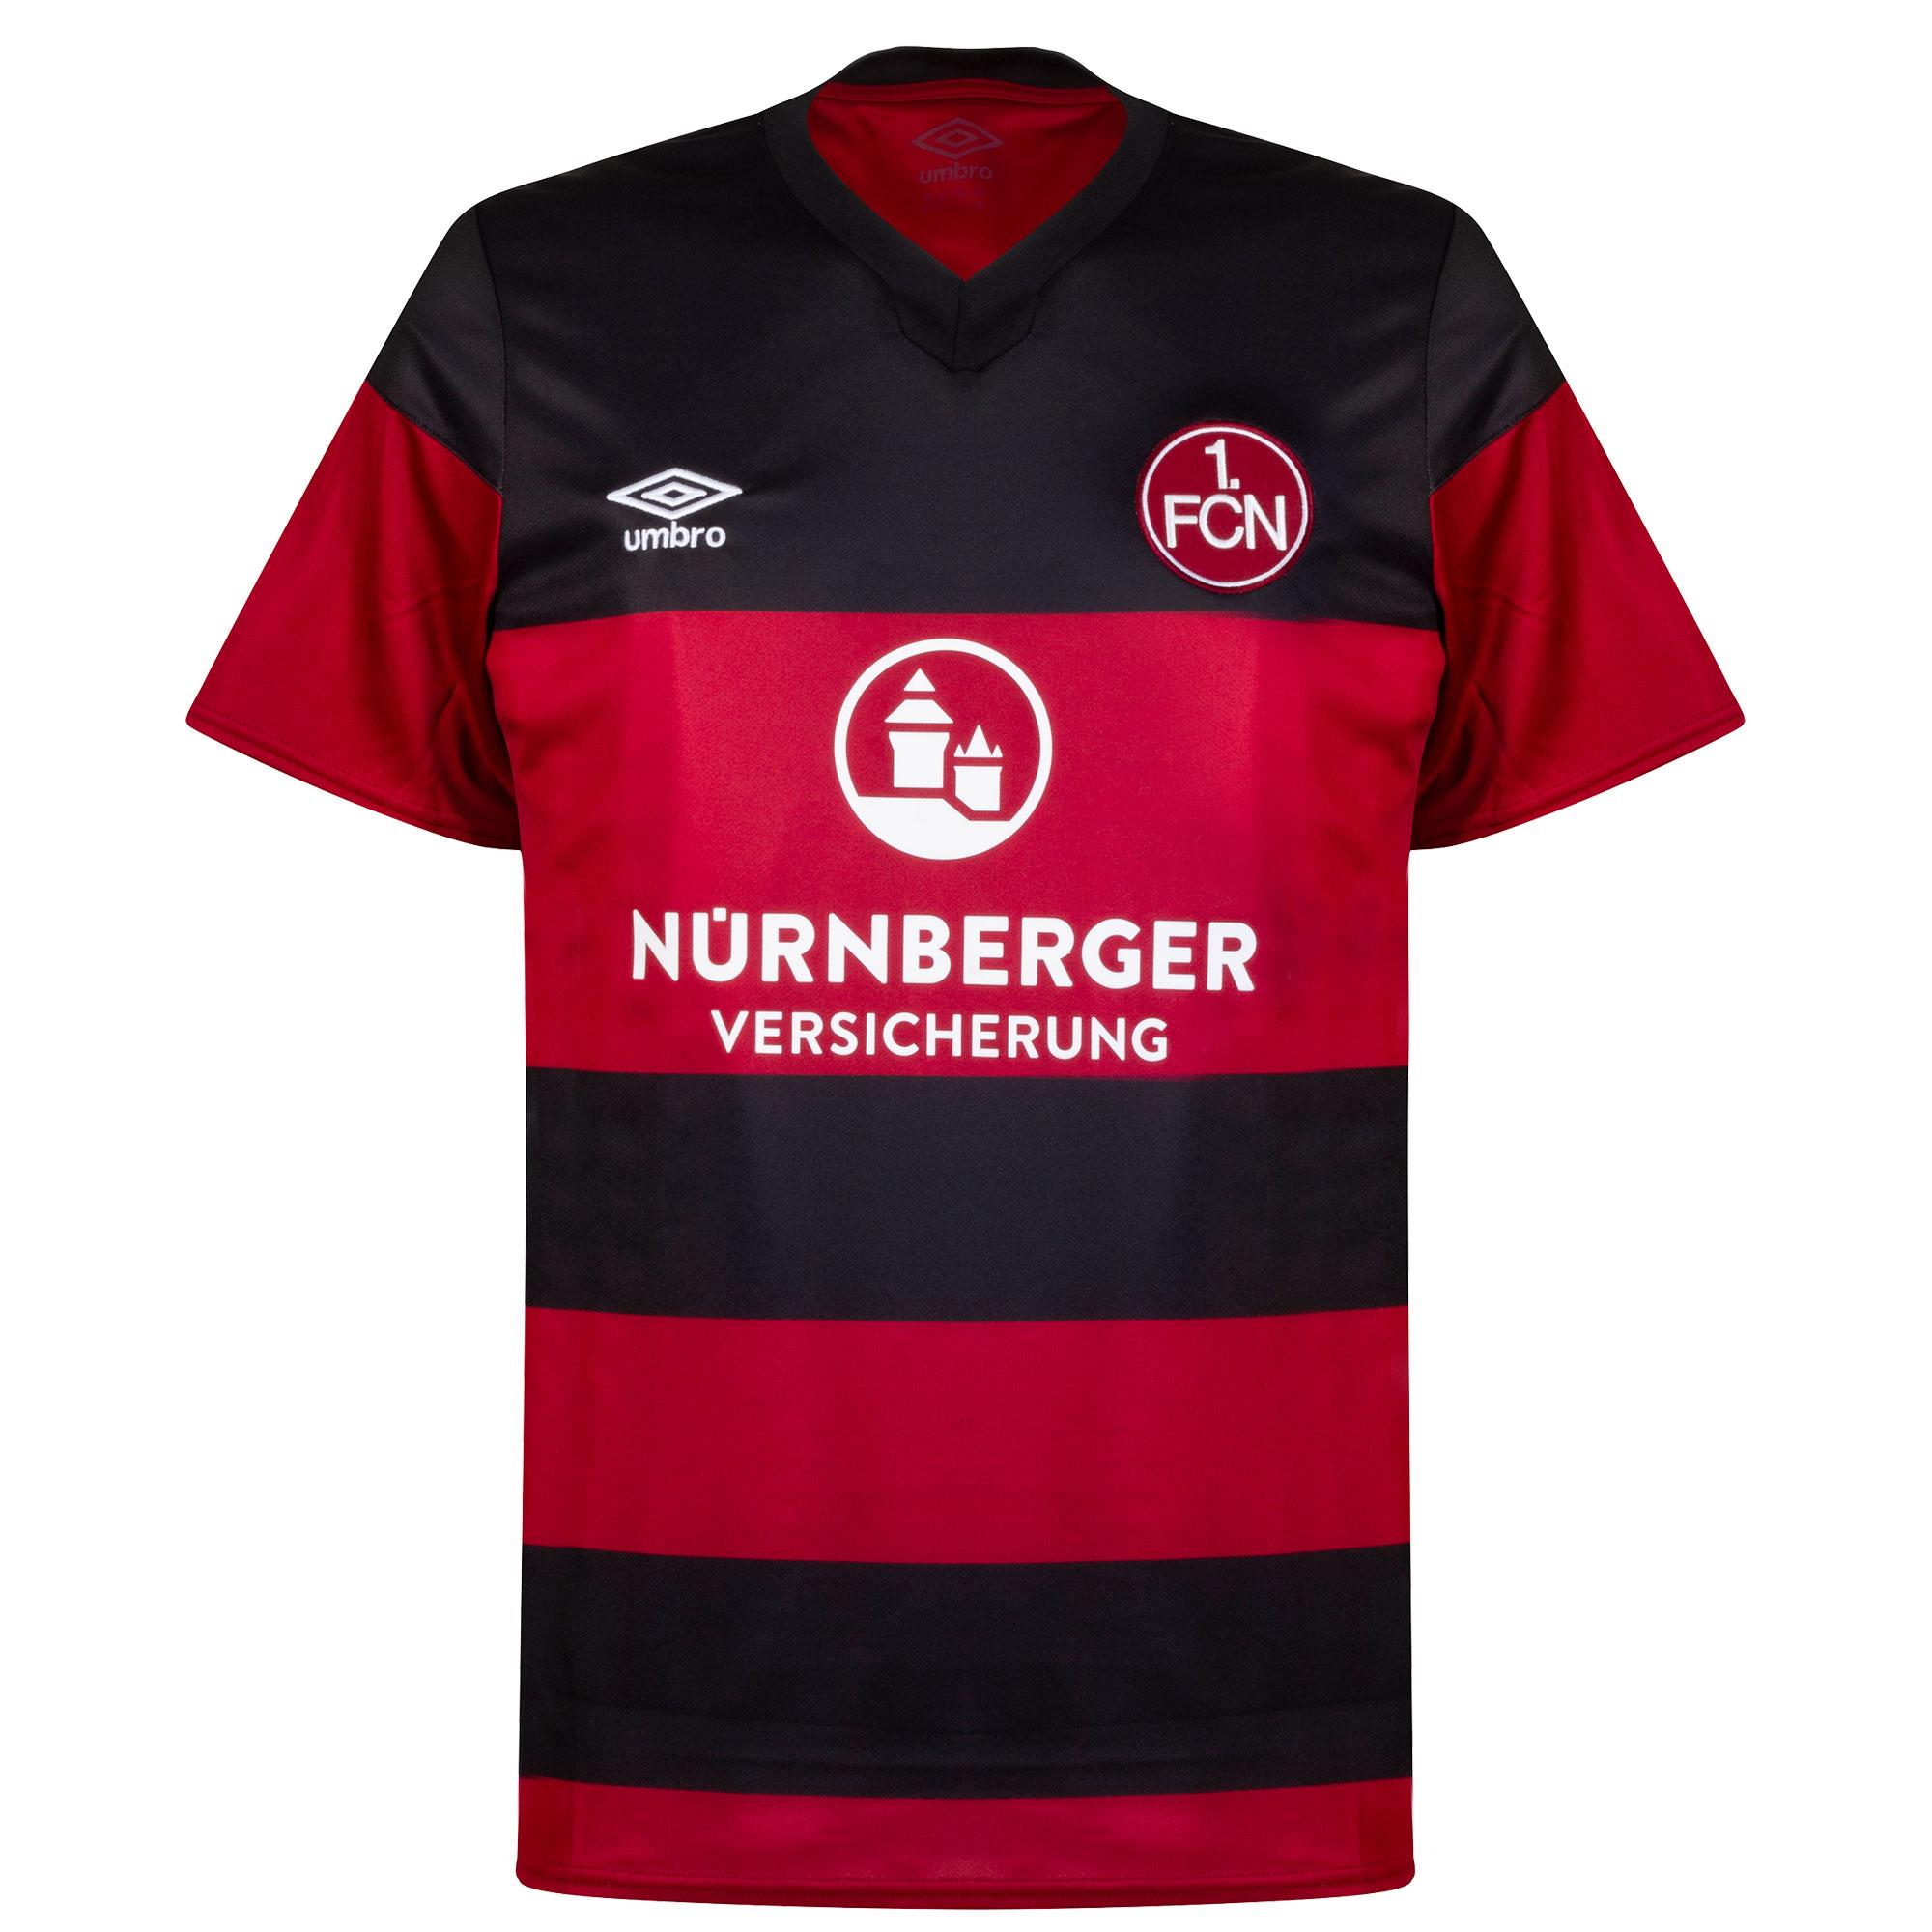 Nurnberg home shirt